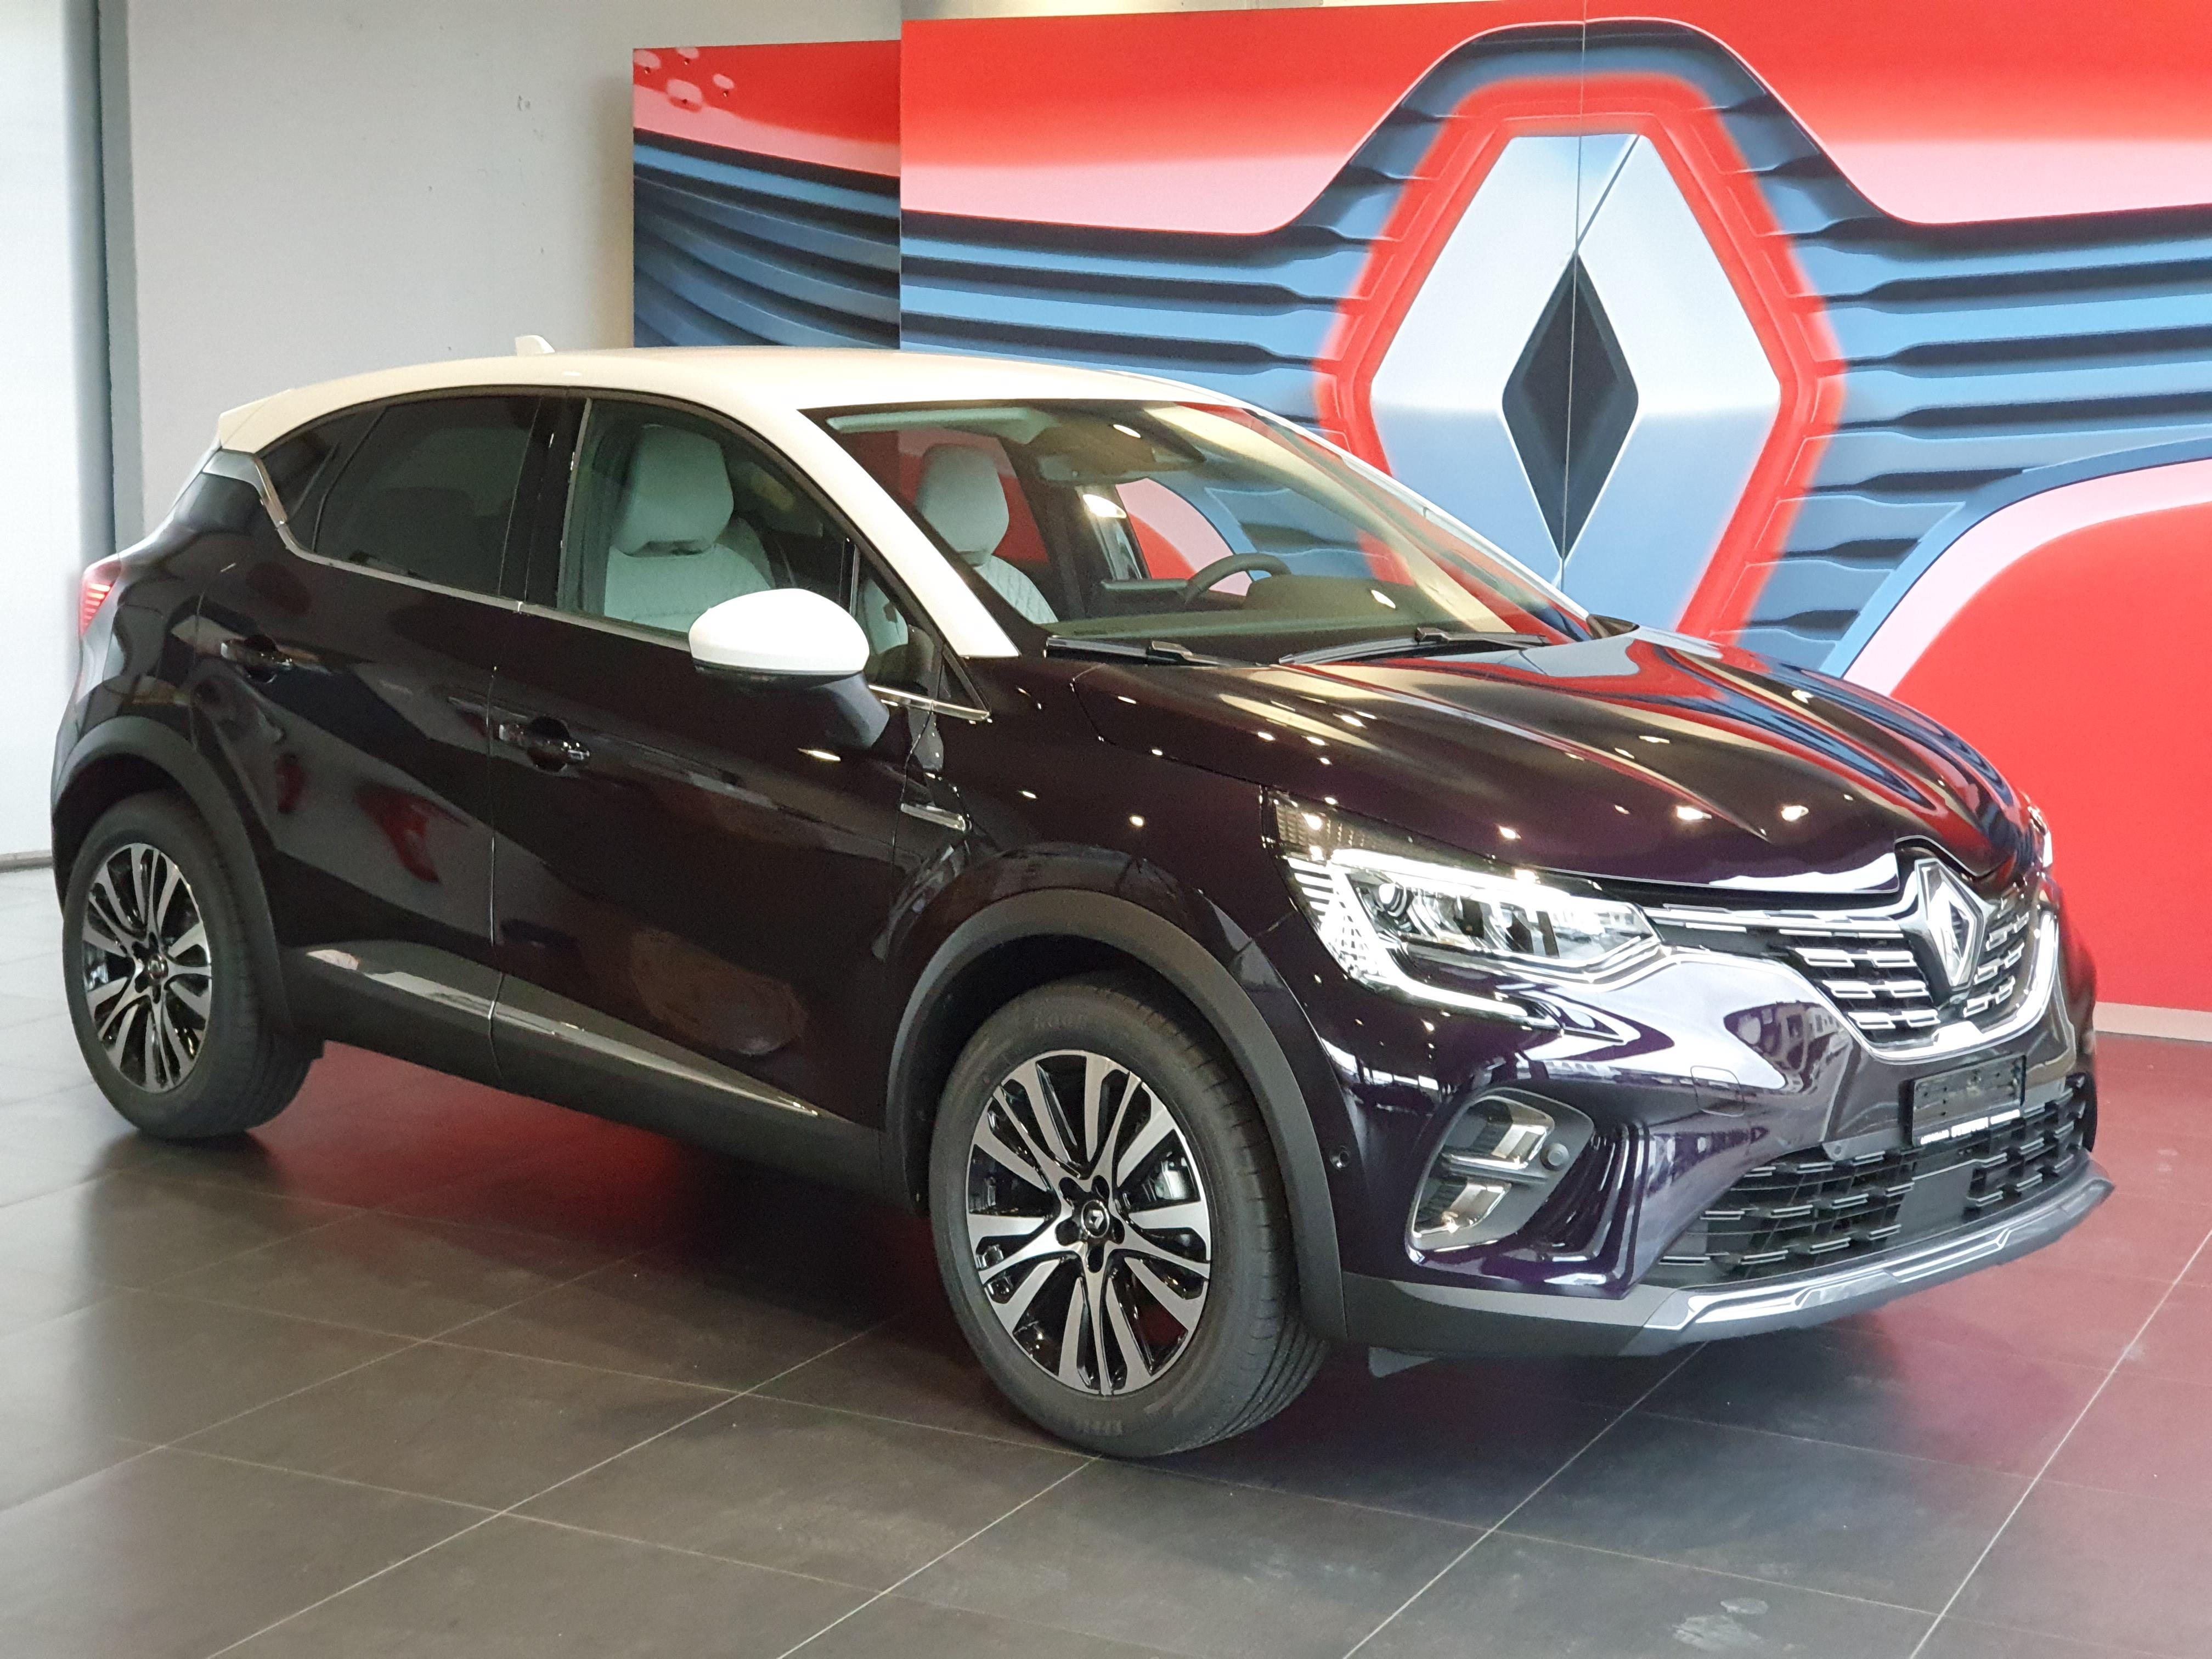 Renault Captur Sursee